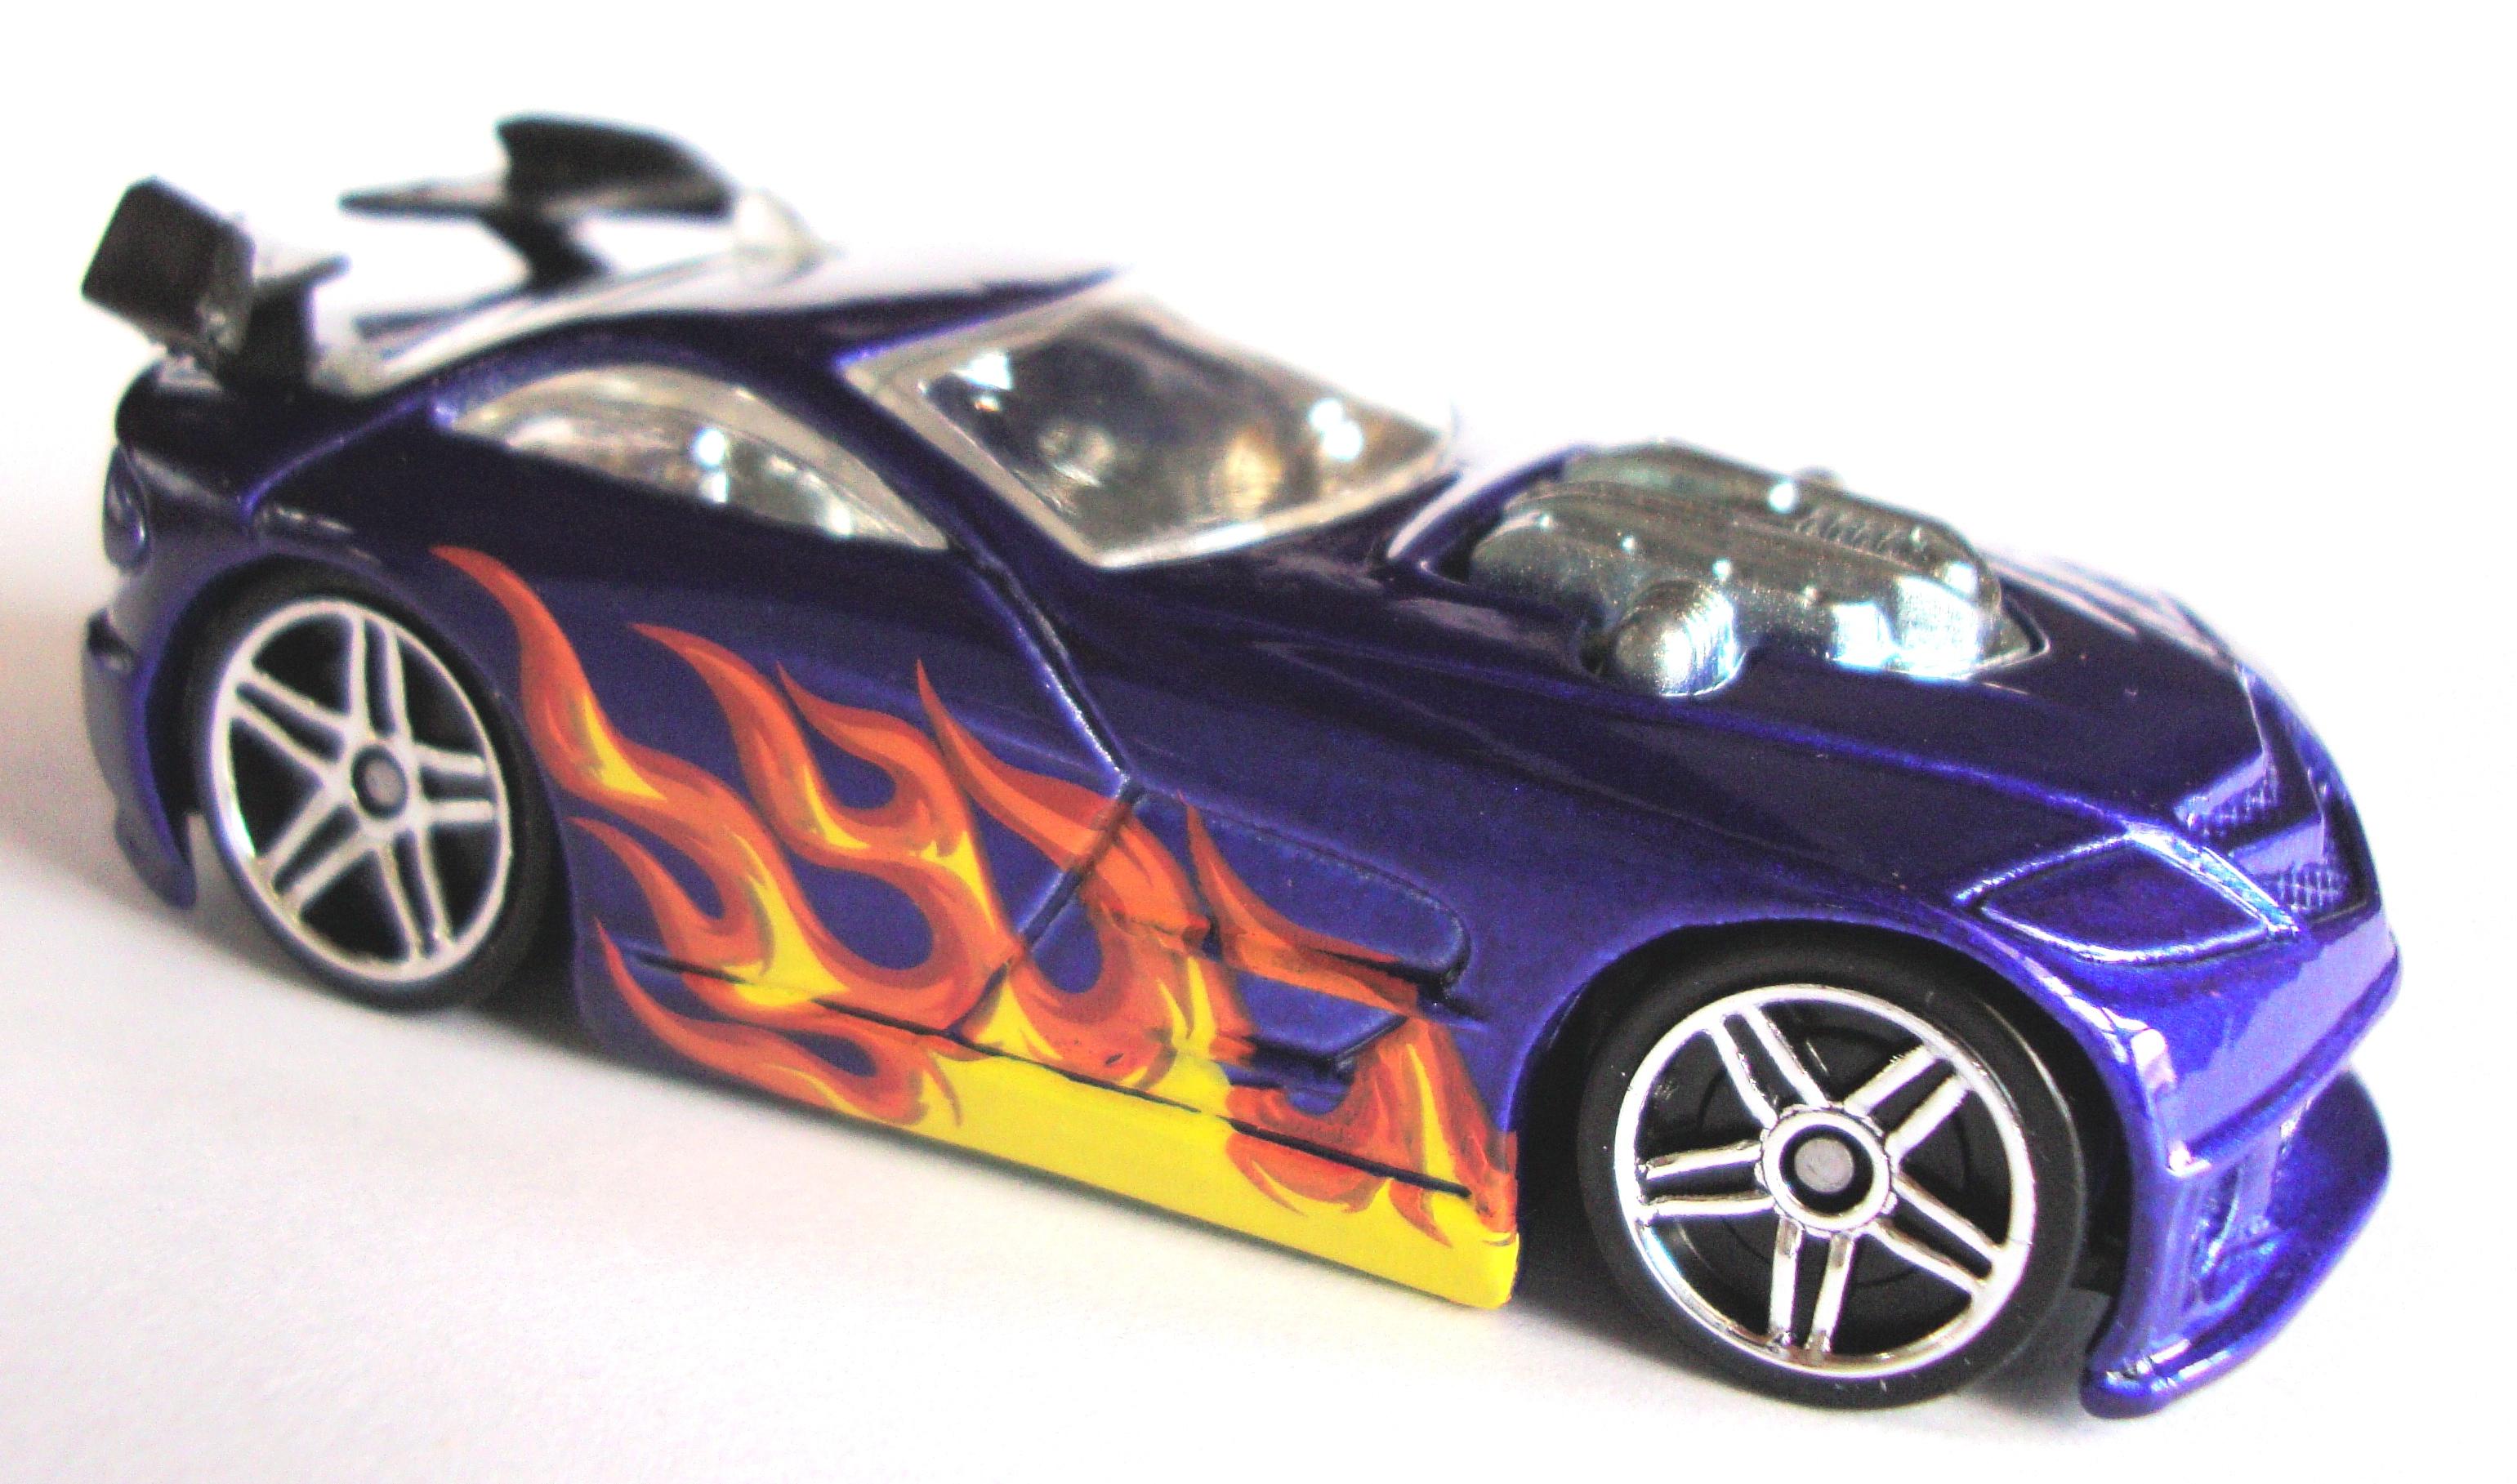 Hobao Car 10x16x5mm 2pcs #88230 RC-WillPower Hyper 8 Center Diff Bearing